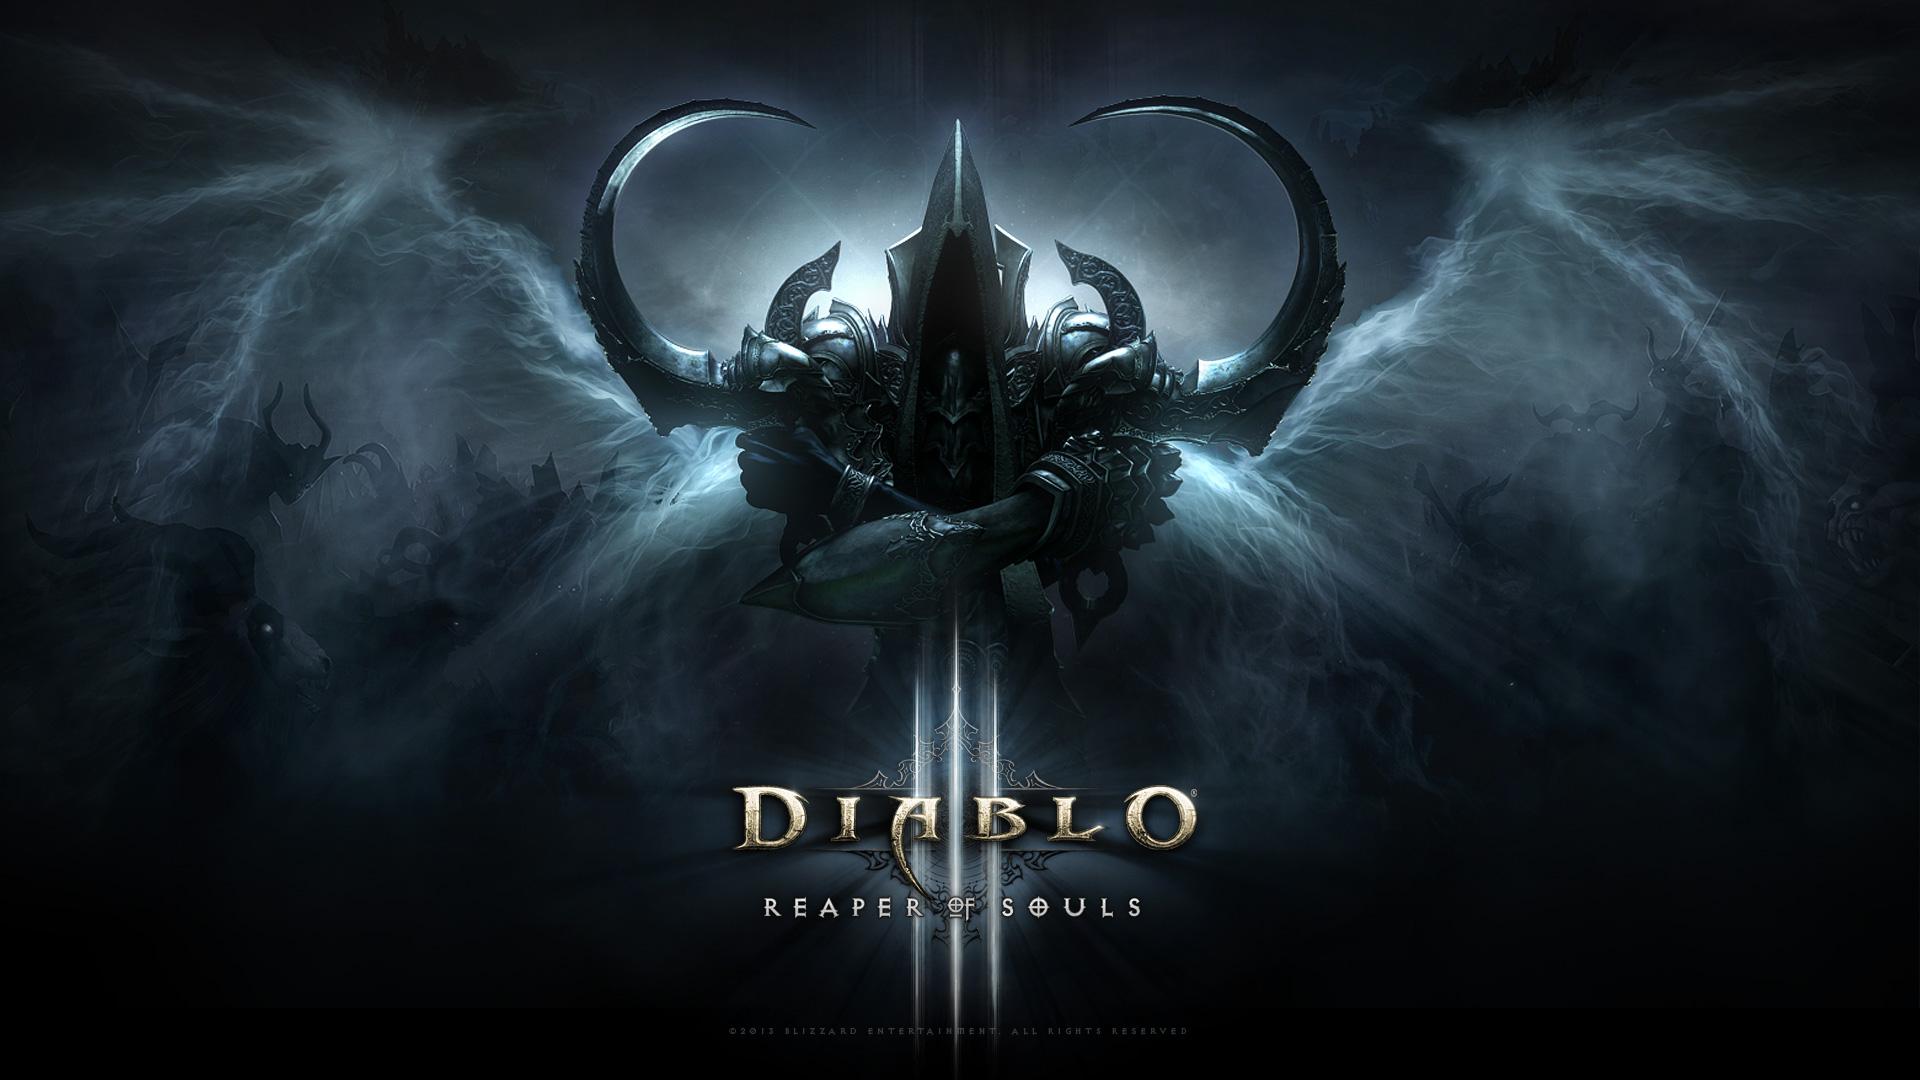 [Diablo 3] – Reaper of Souls erscheint im März